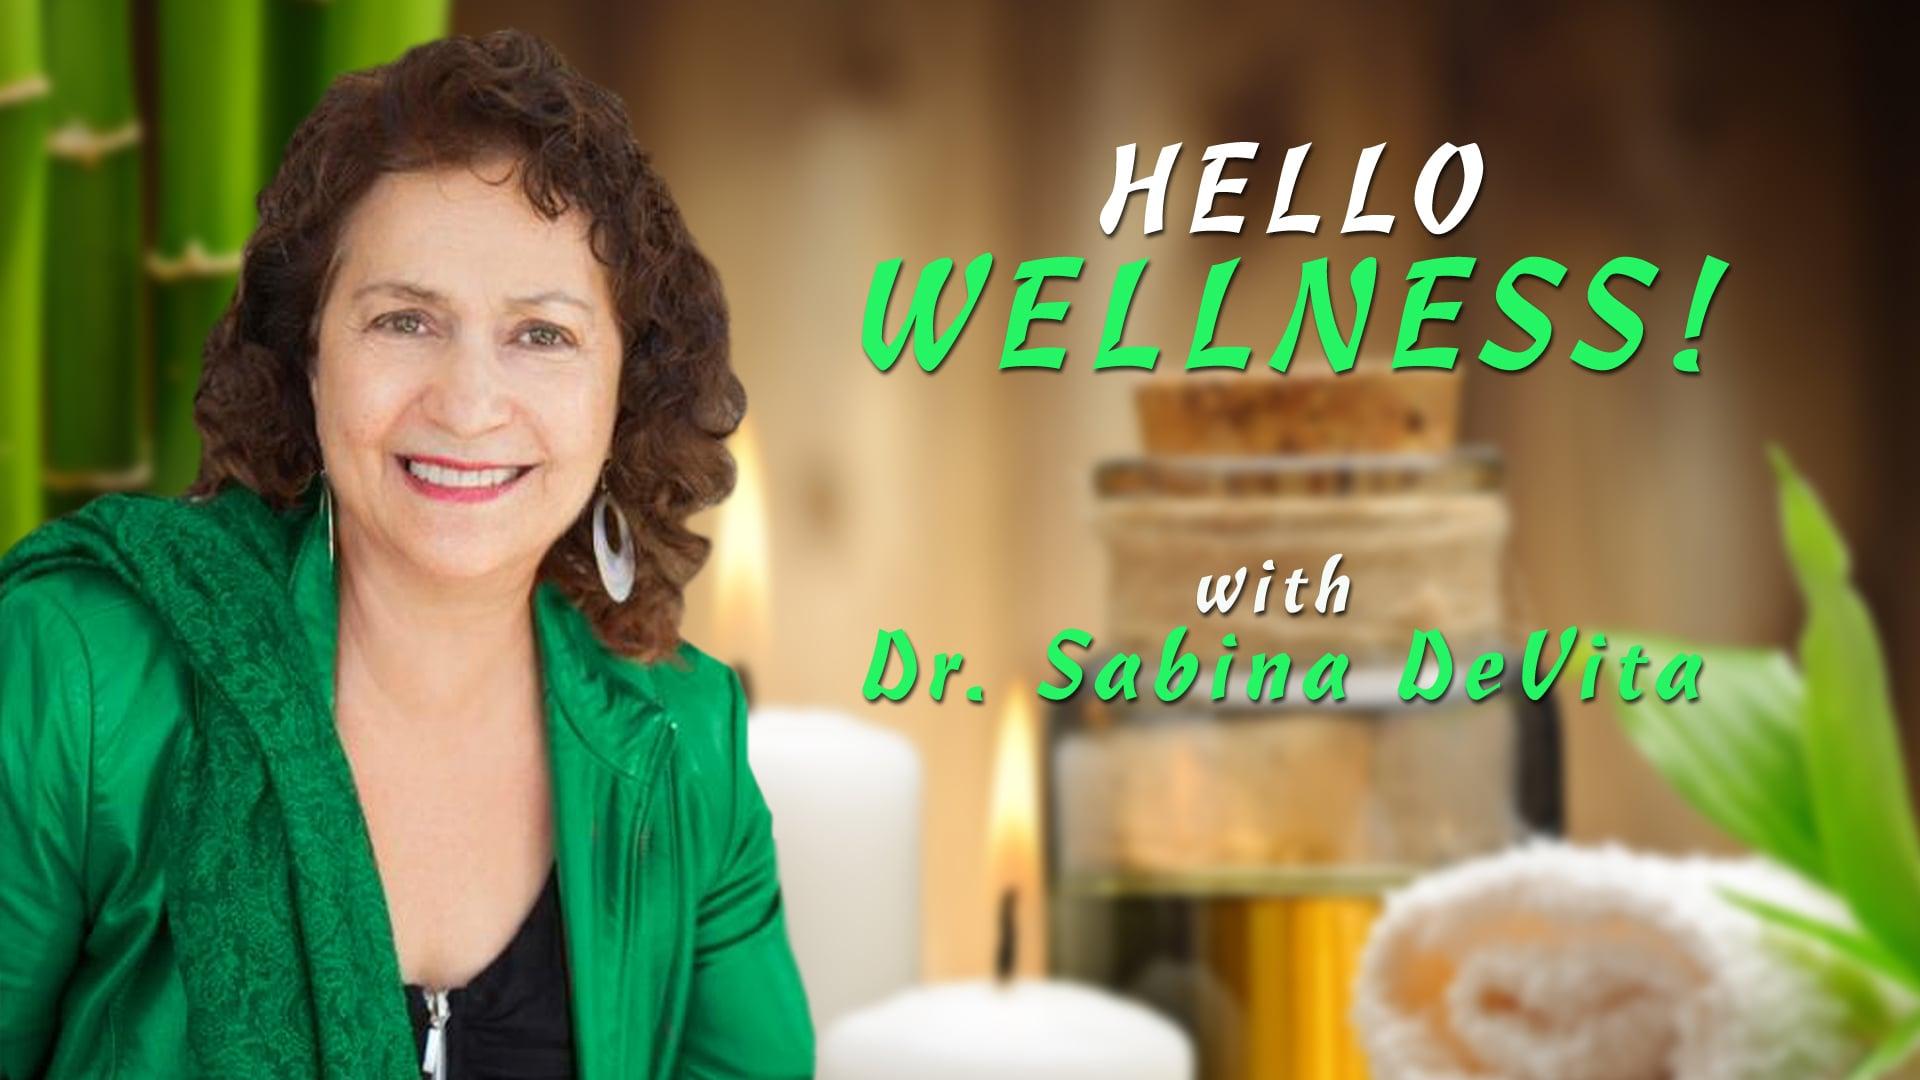 Hello Wellness! Greenerize Your Home.